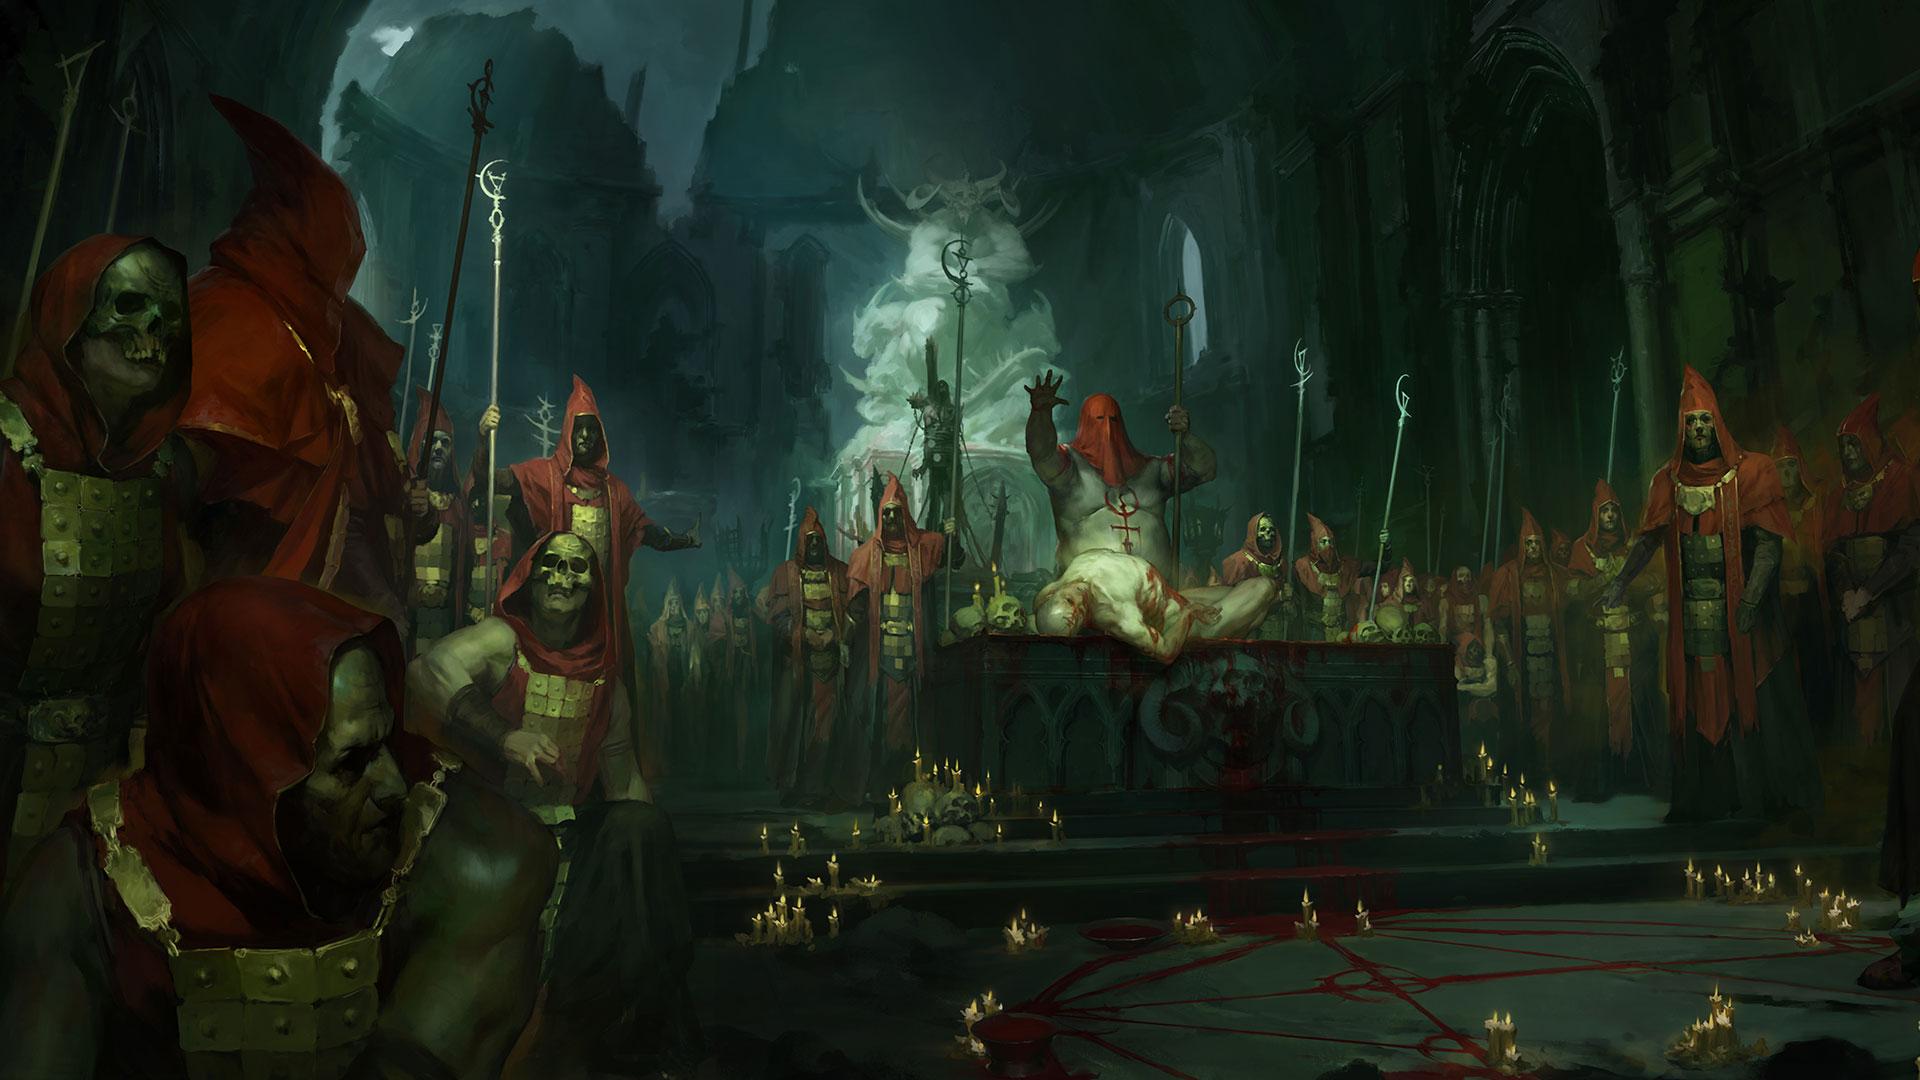 Diablo 4 Wallpapers Hd Desktop Mobile Backgrounds Pro